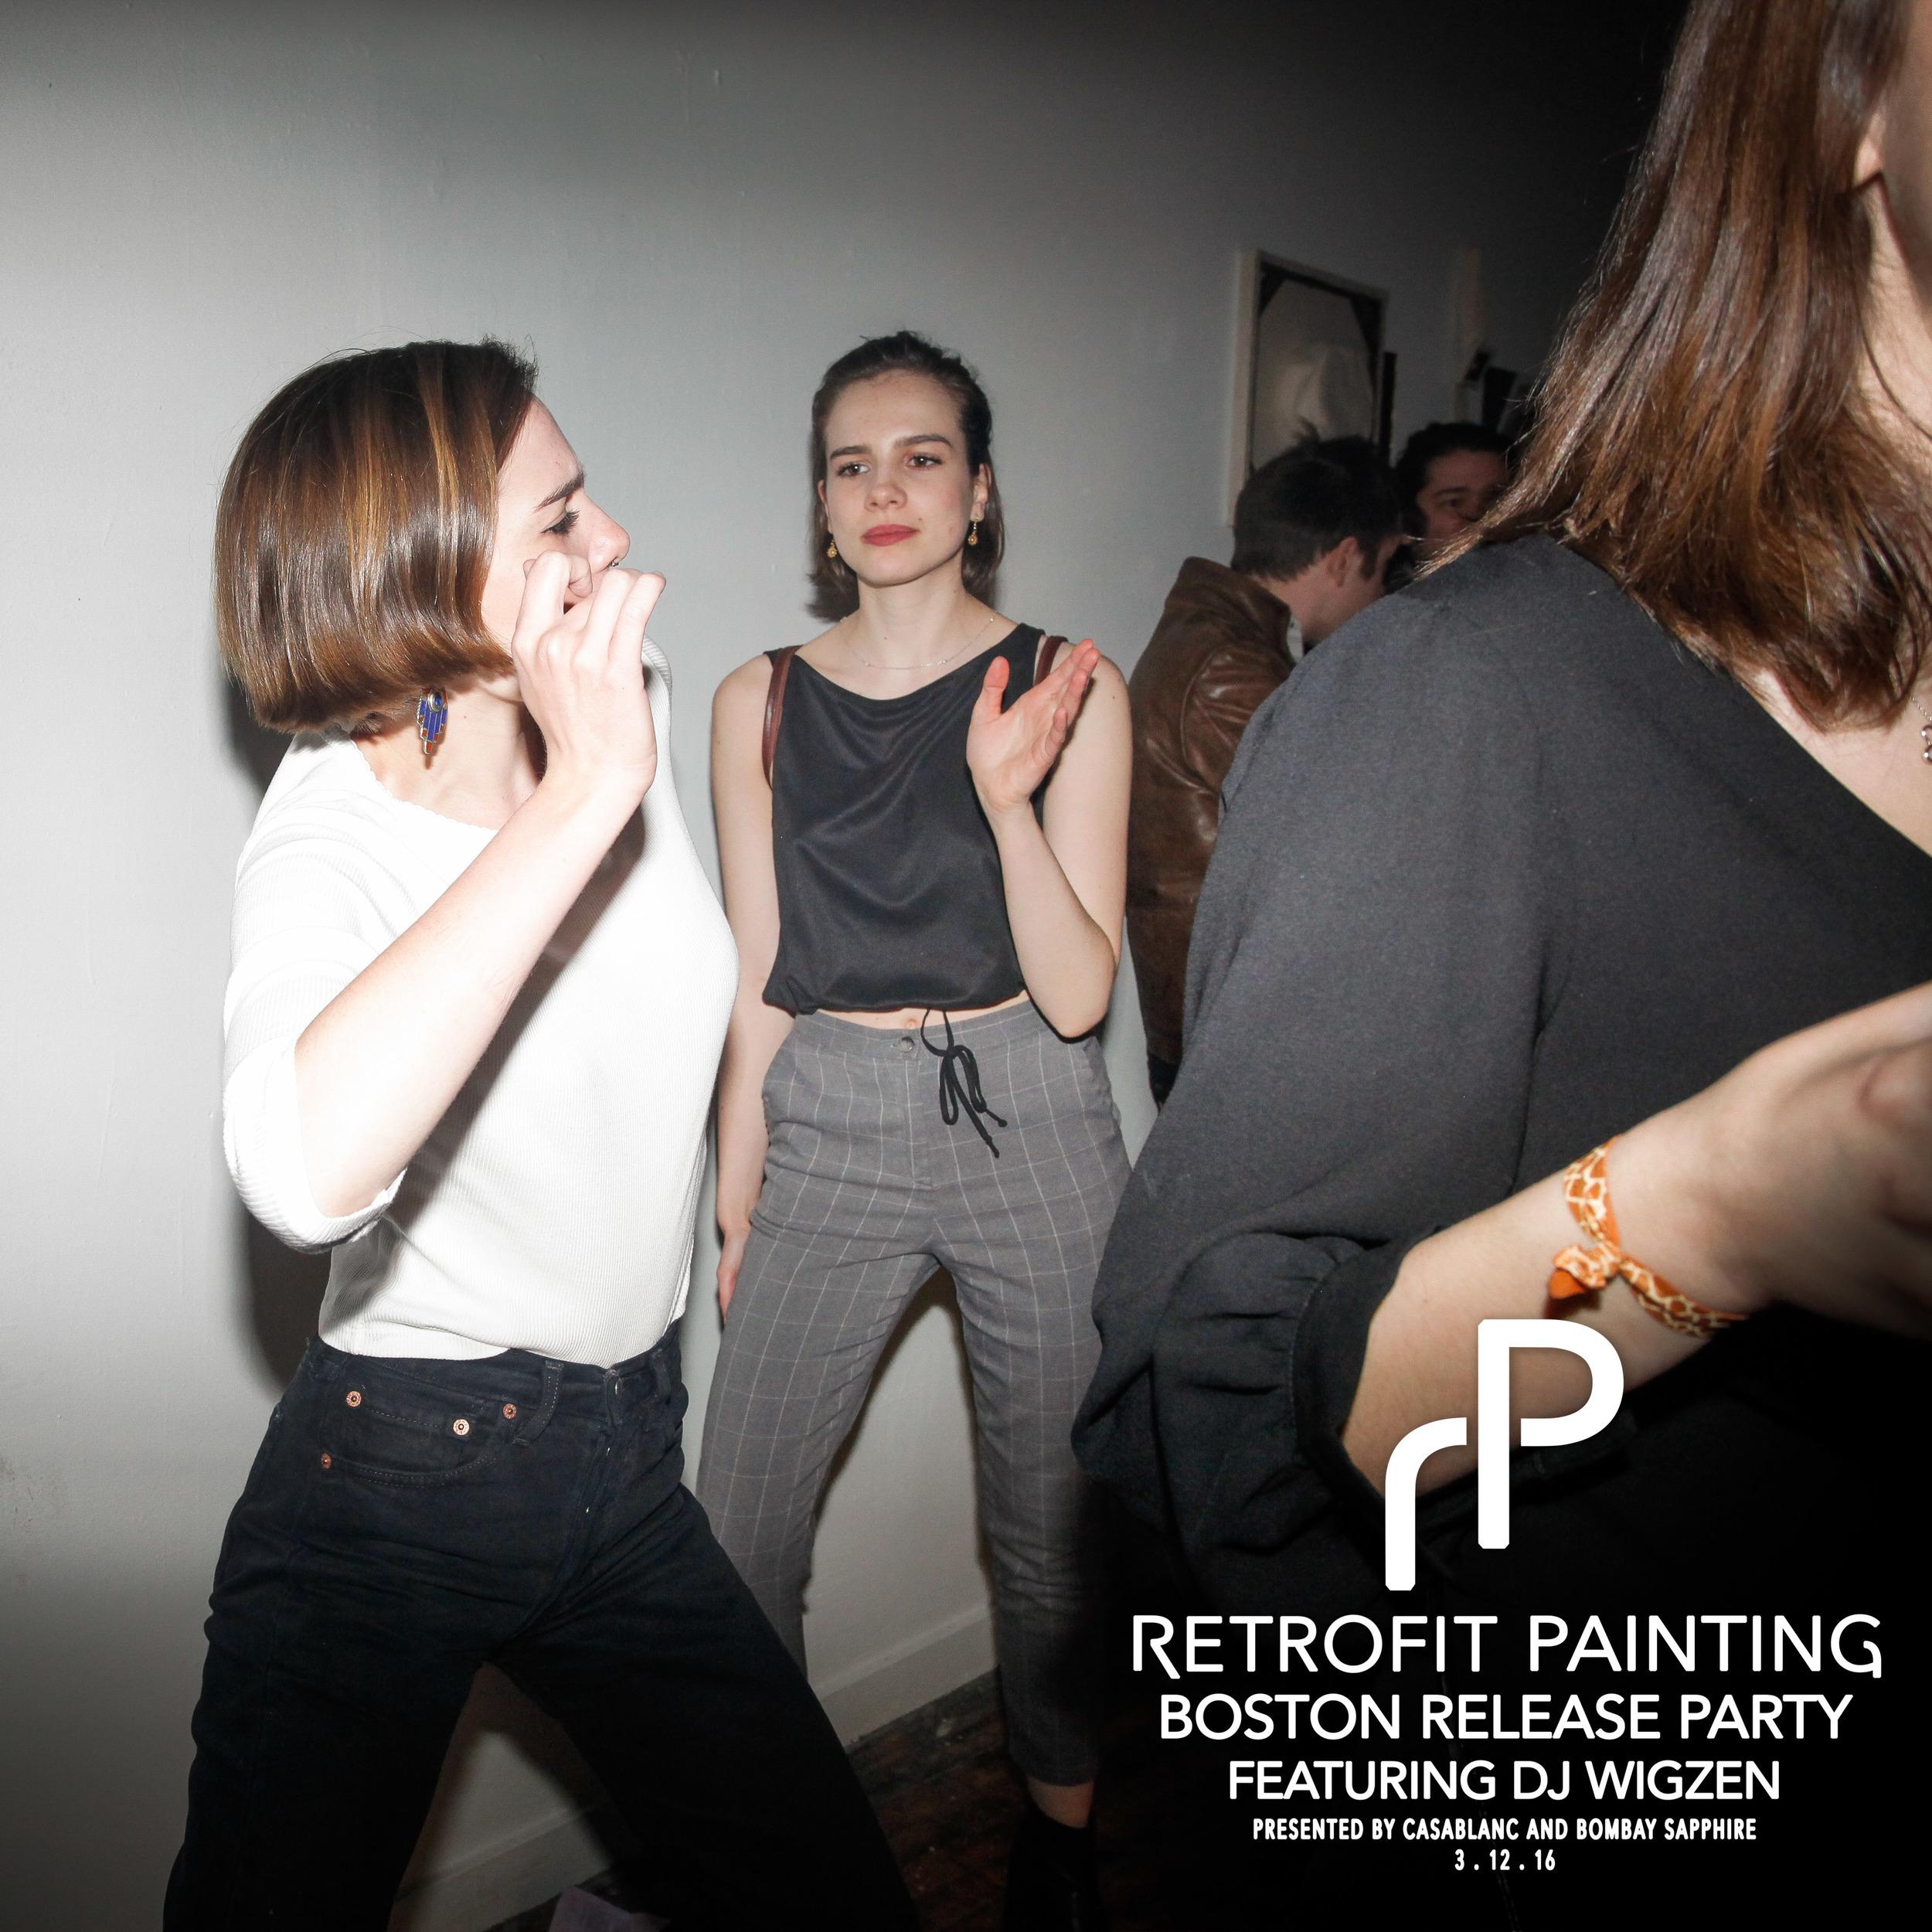 Retrofit Painting Boston Release Party 0129.jpg